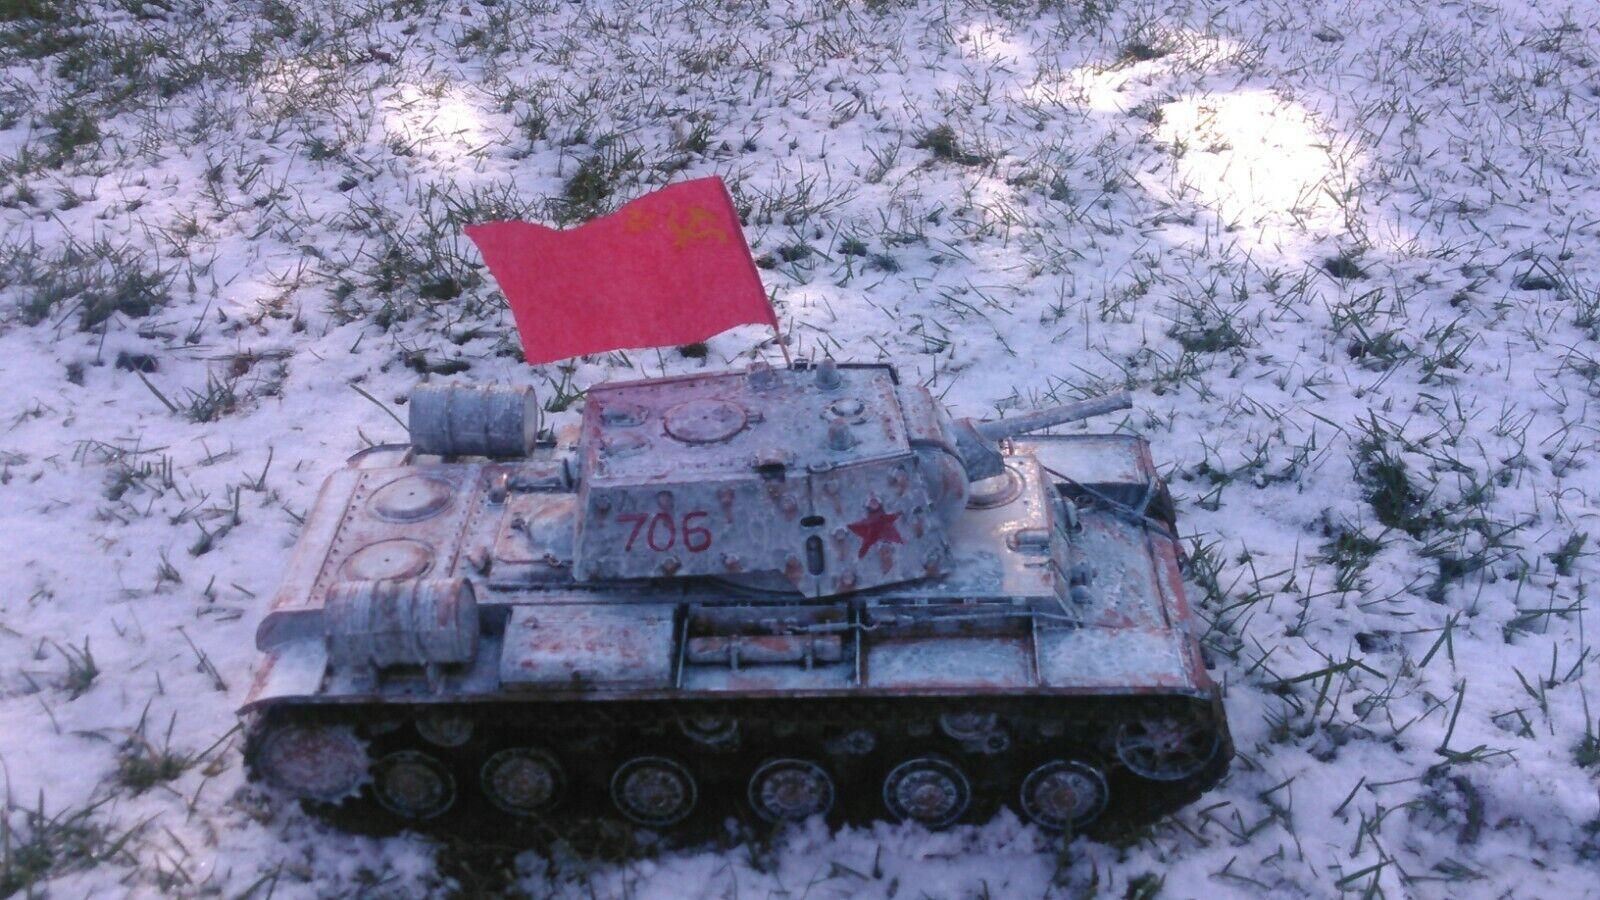 1 16 Scale Heng Long RC Tank Russian KV-1 Custom Paint Metal Upgrades - $299.00